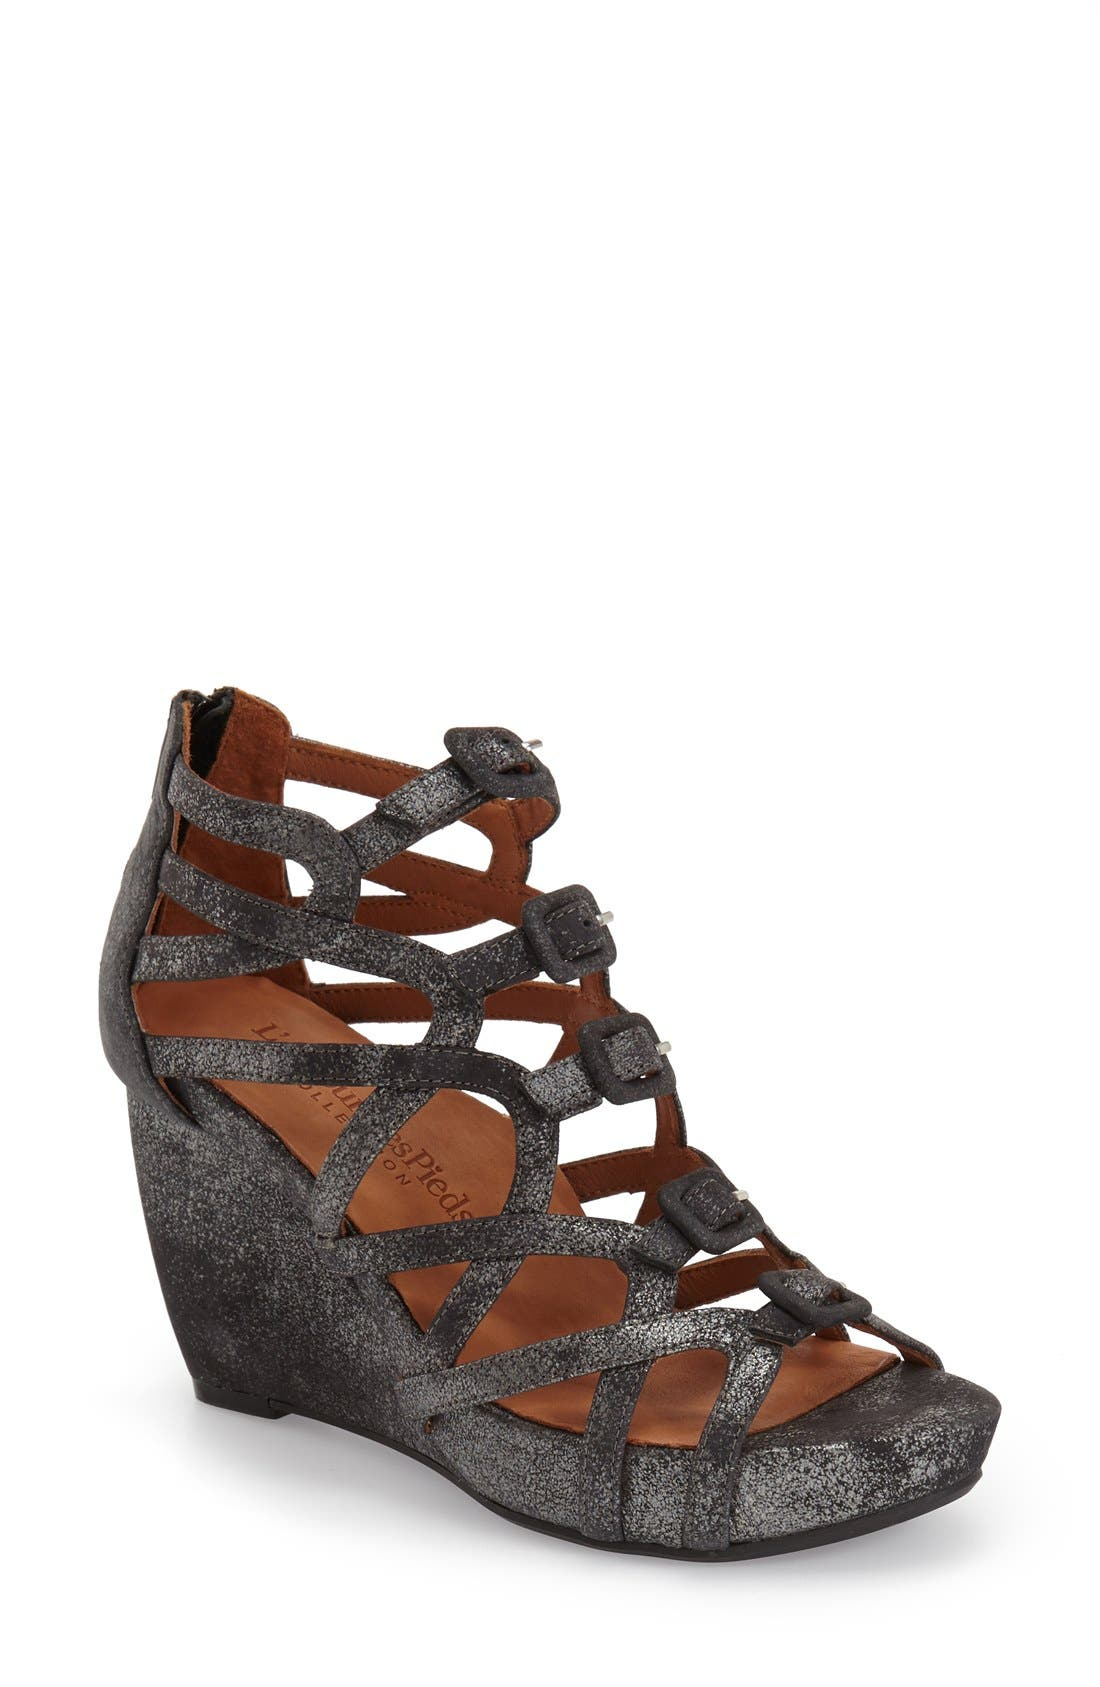 Ivanna' Gladiator Wedge Sandal,                             Main thumbnail 1, color,                             Graphite Leather